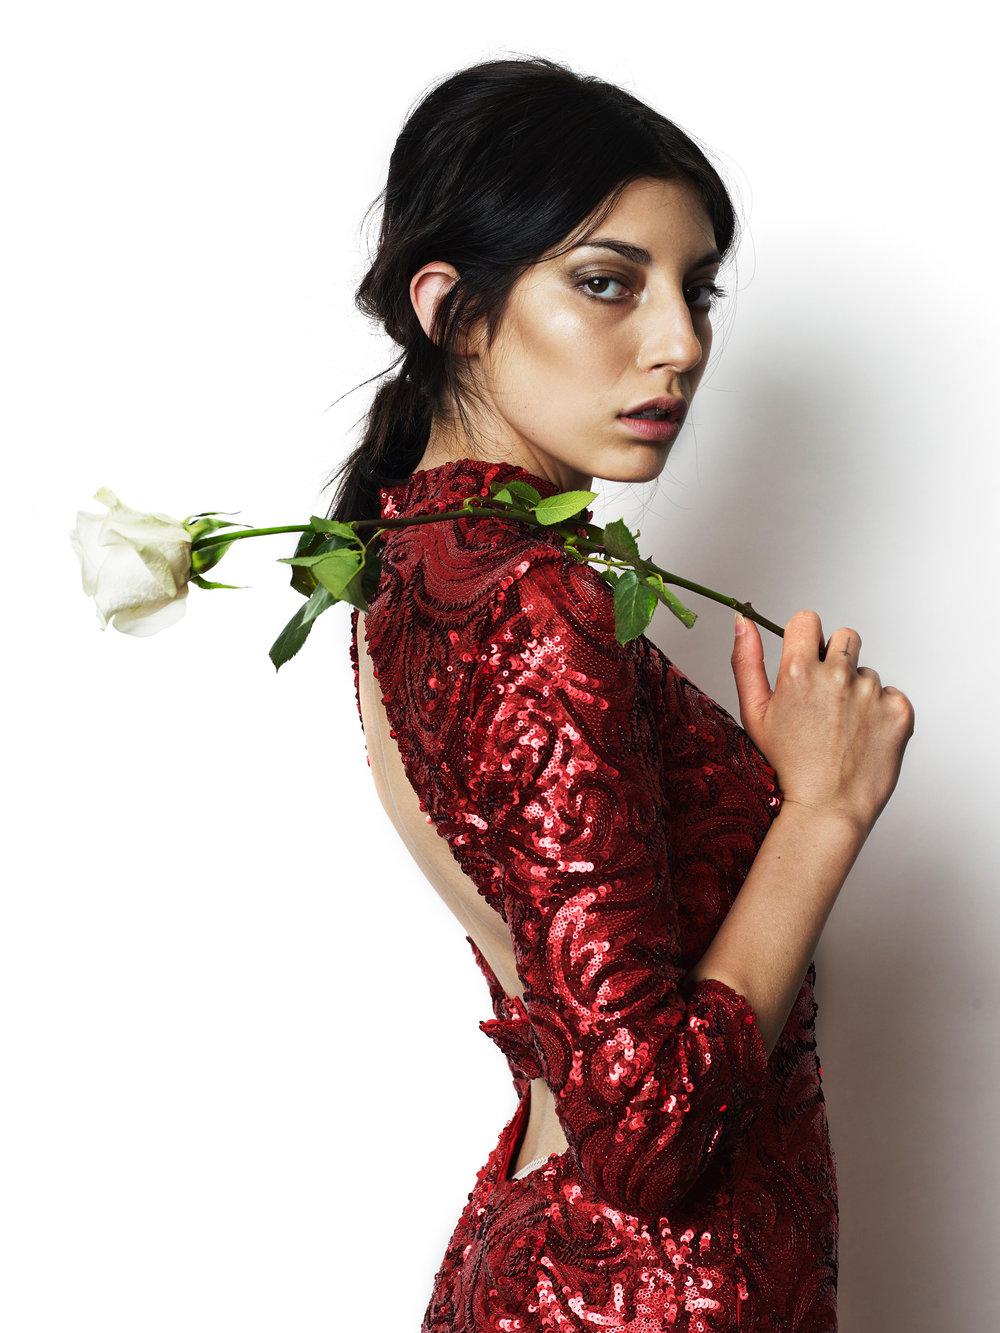 Photographer: Sergio Necoechea | Model: (Artist) Death by Romy | Hair: Brianna Barela | Makeup by Ashley Tani